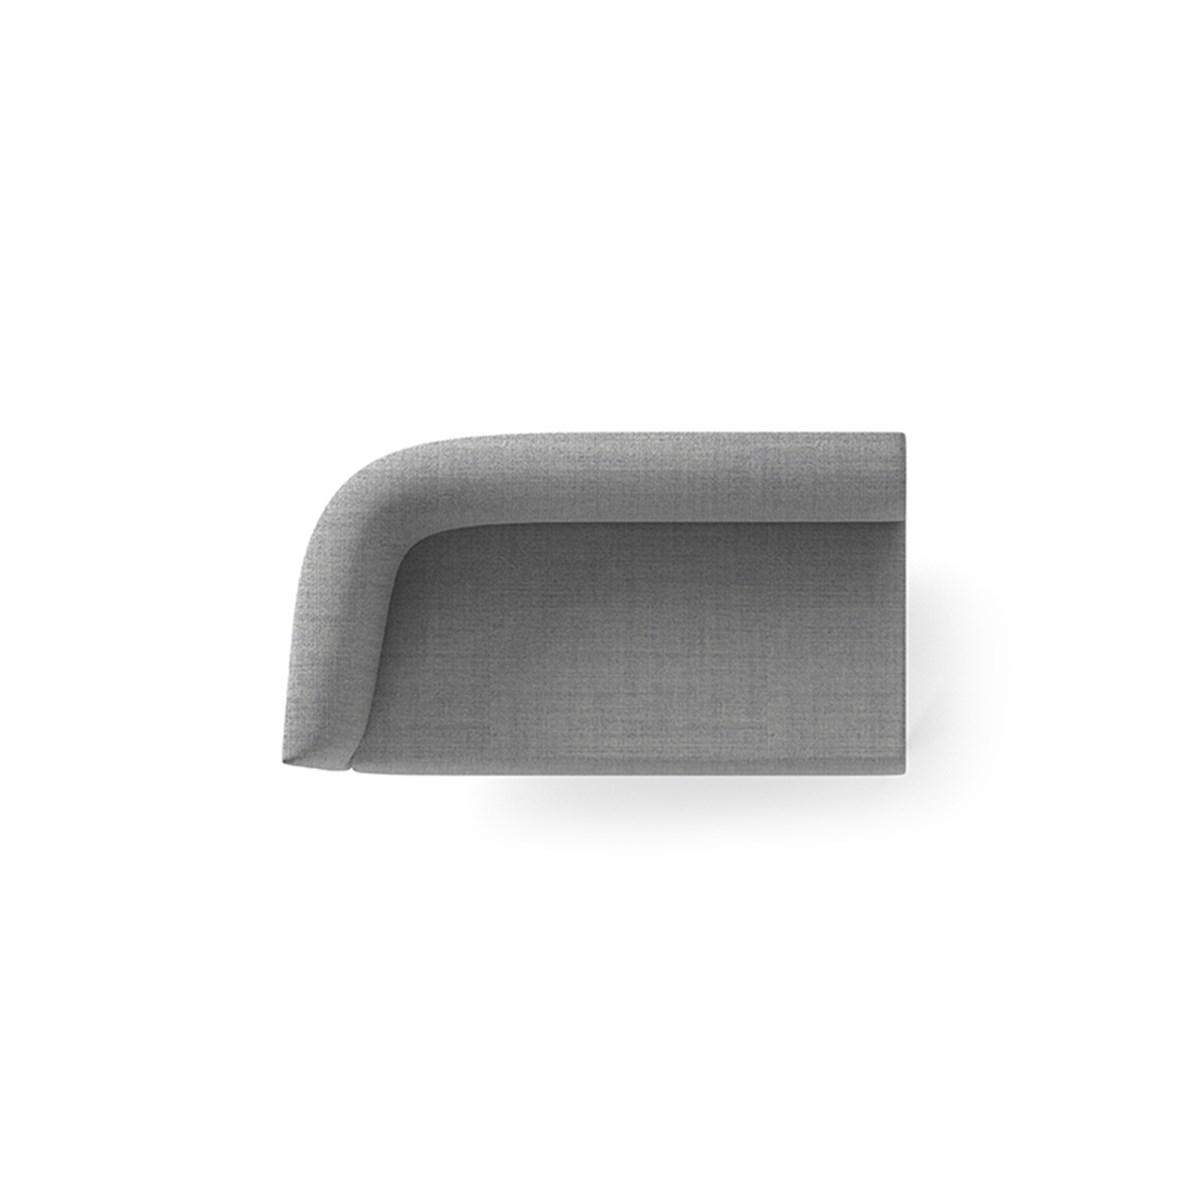 Neospace-Ridgeway-Sofa-System-Contract-Matisse-3